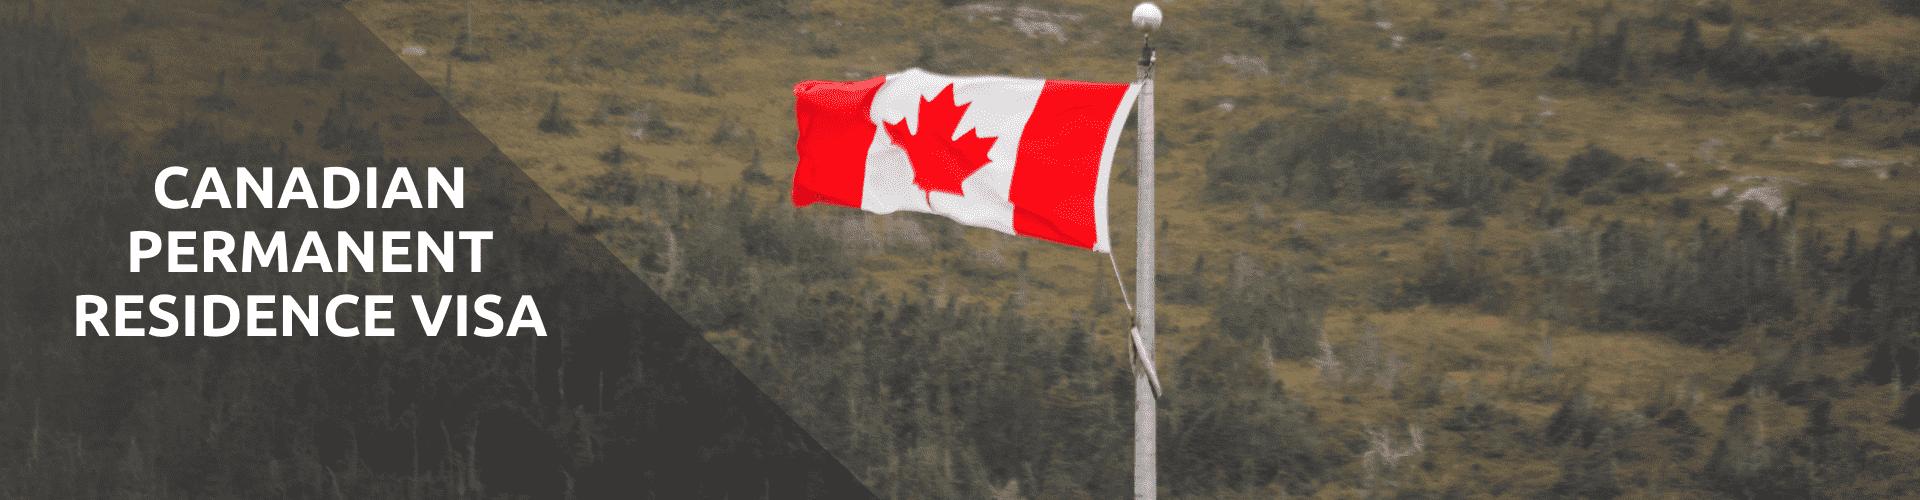 Canadian Permanent Residency Visa